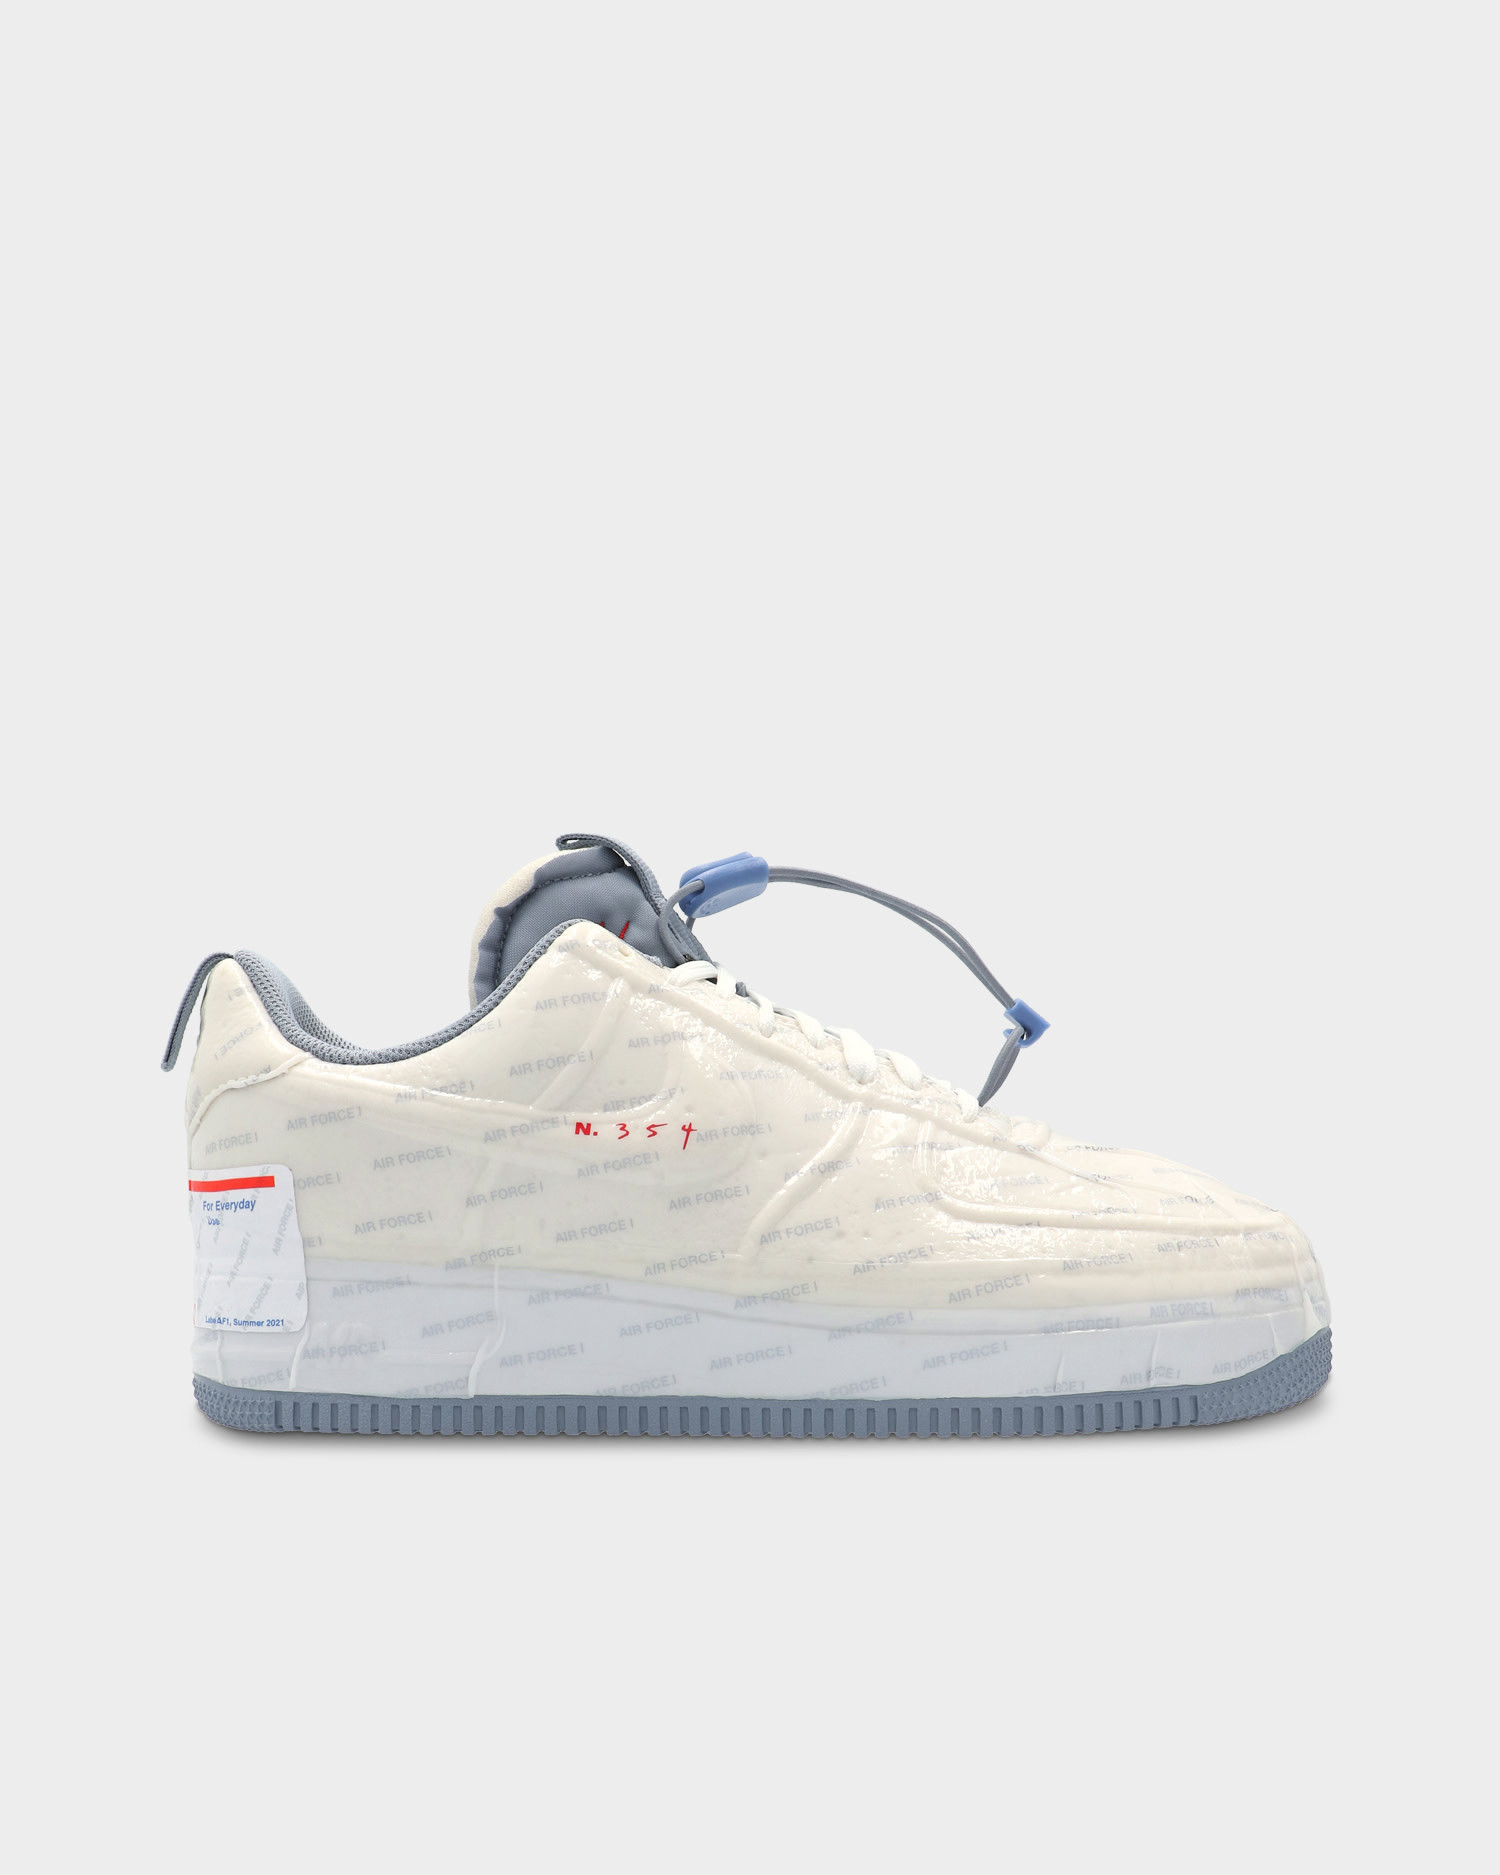 Nike Air Force 1 Experimental White Ghost/Ashen Slate/Game Royal